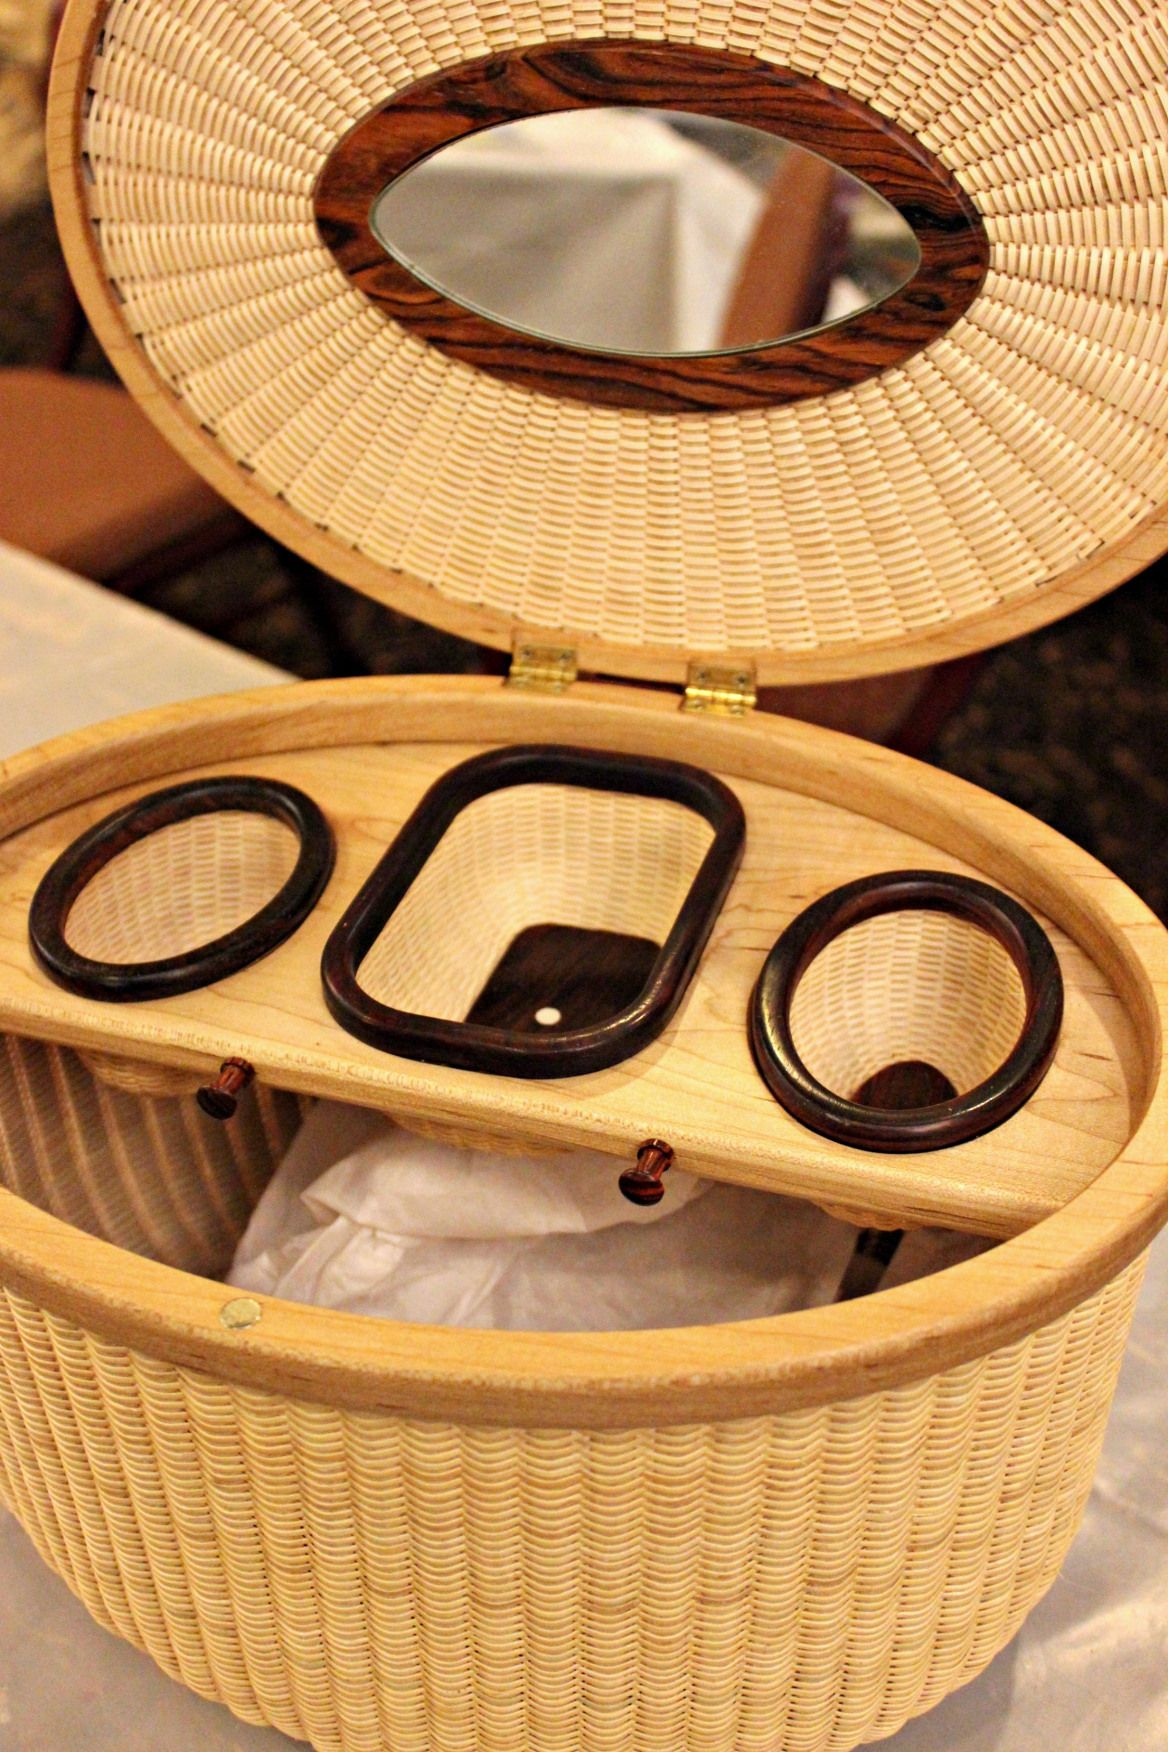 Basket Weaving Supplies Atlanta : Georgia basketry association convention inside of